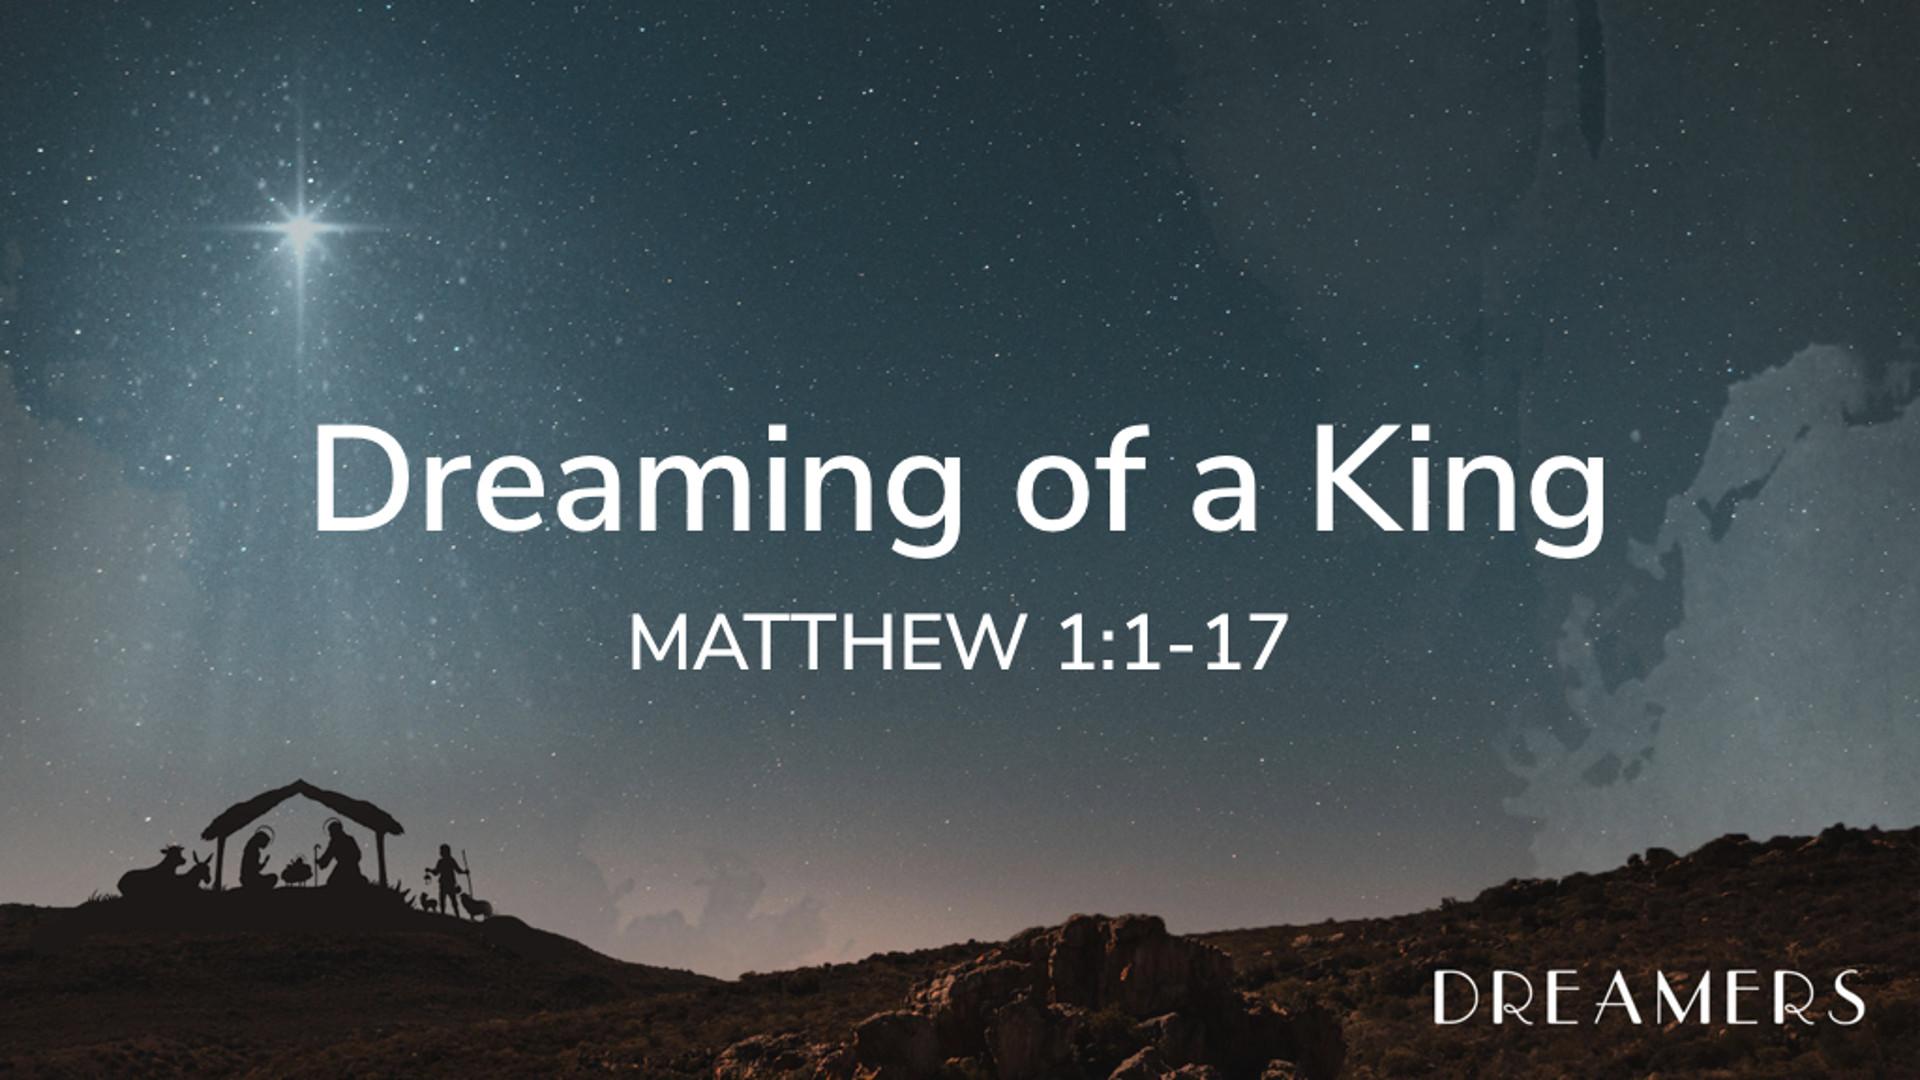 Matt 1.1-17 - Dreaming of a King.jpg